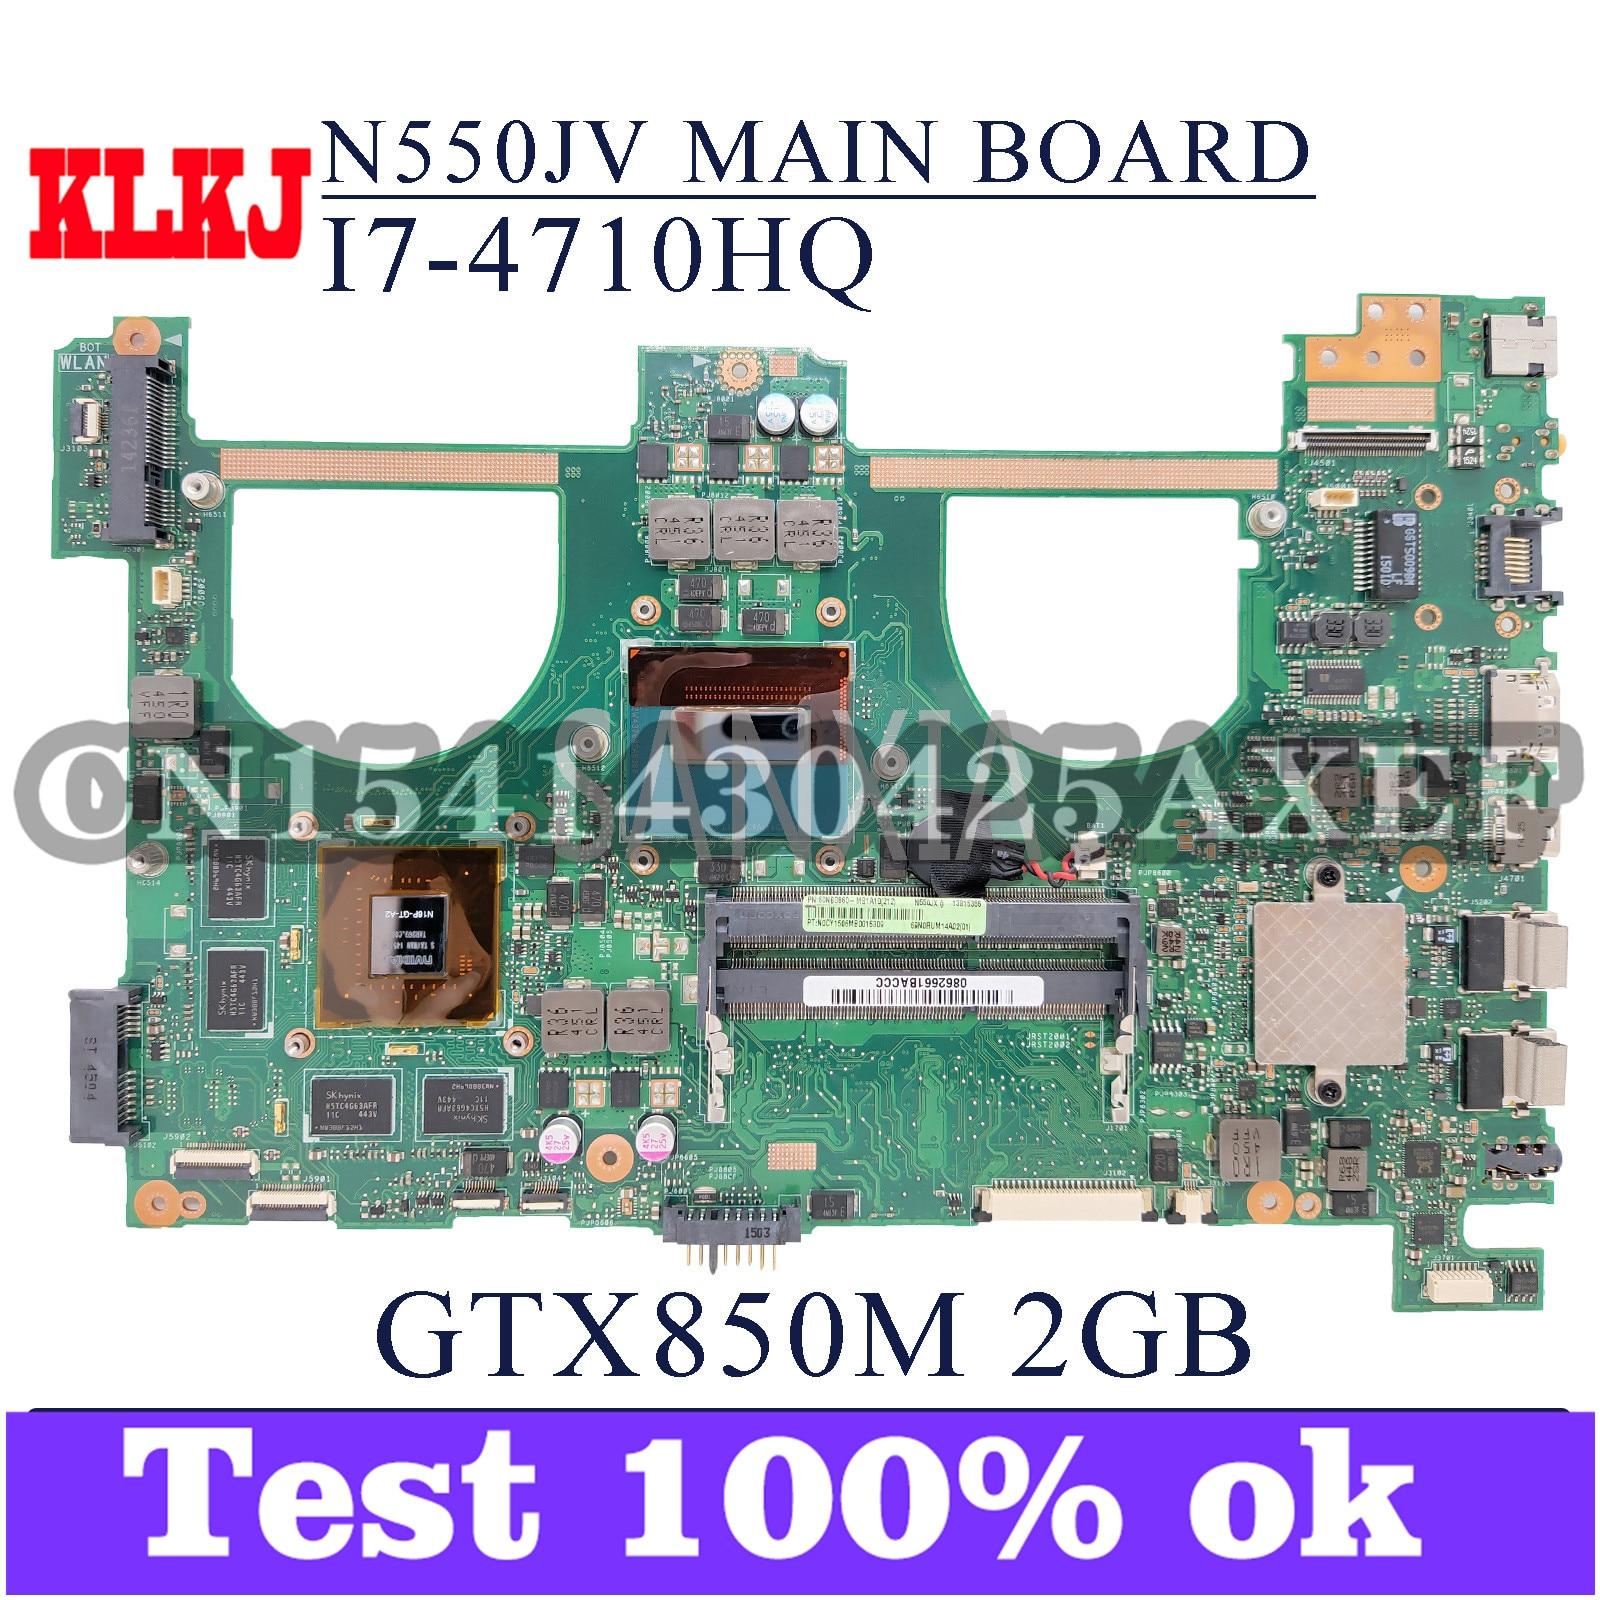 KLKJ N550JV اللوحة لابتوب ASUS VivoBook N550JK N550JX N550J G550JX G550J اللوحة الأصلية I7-4710HQ GTX850M-2GB